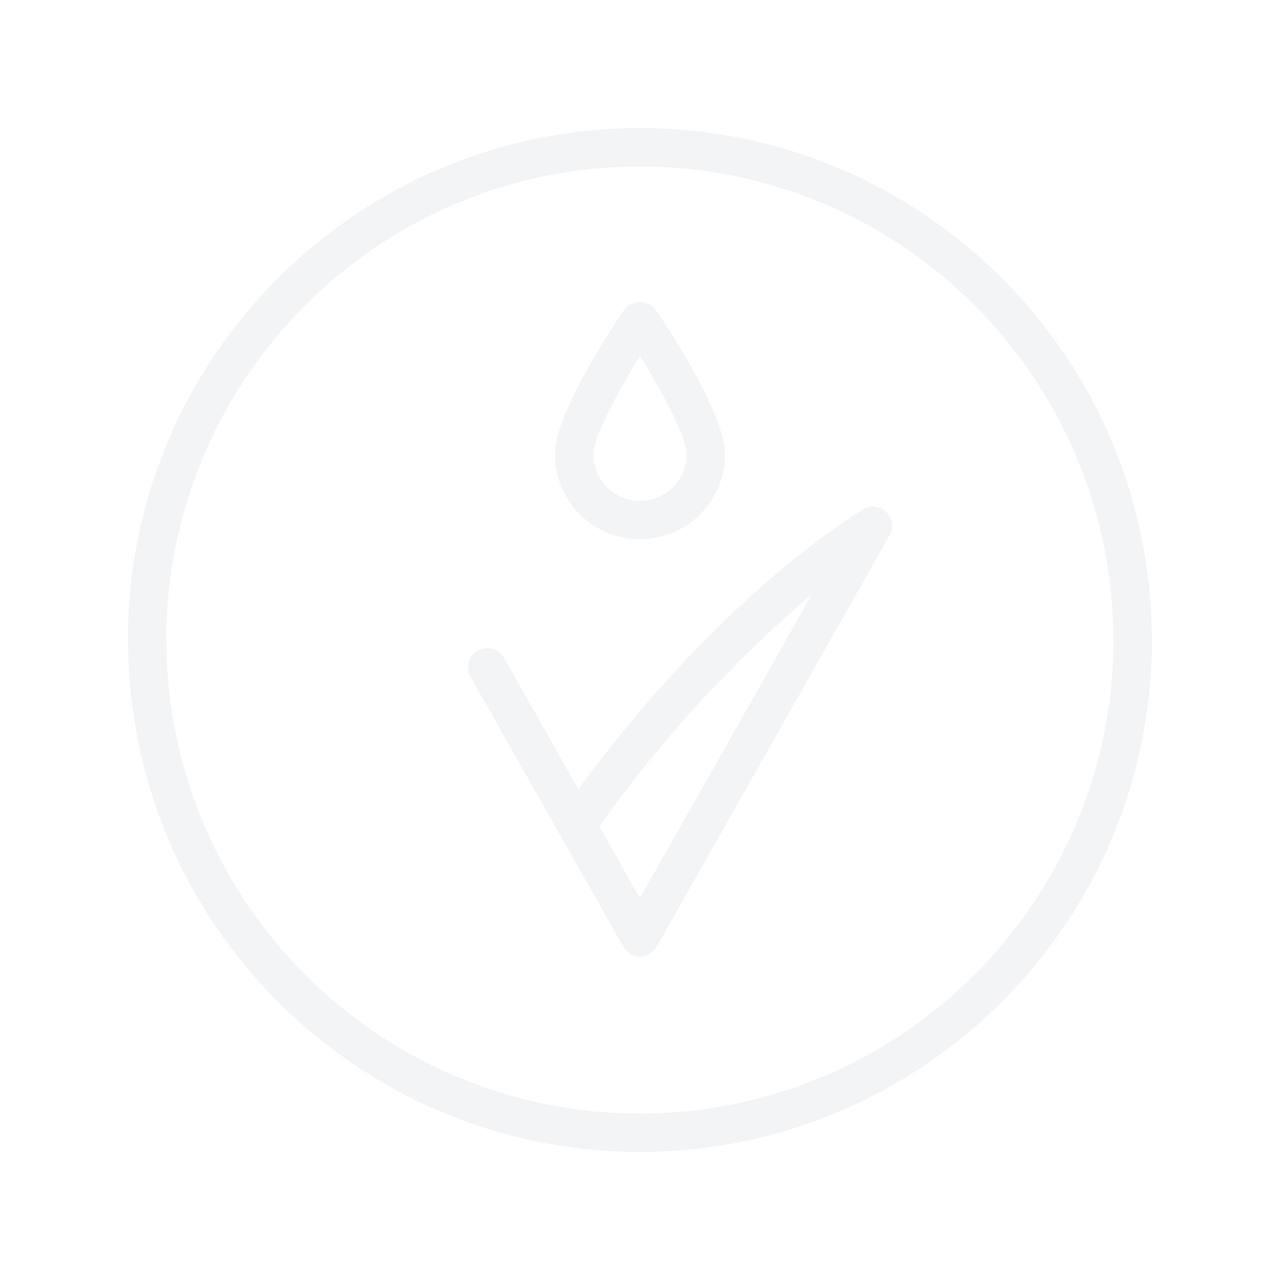 KIDS STUFF CRAZY White Foaming Soap пенное мыло для детских забав 225ml